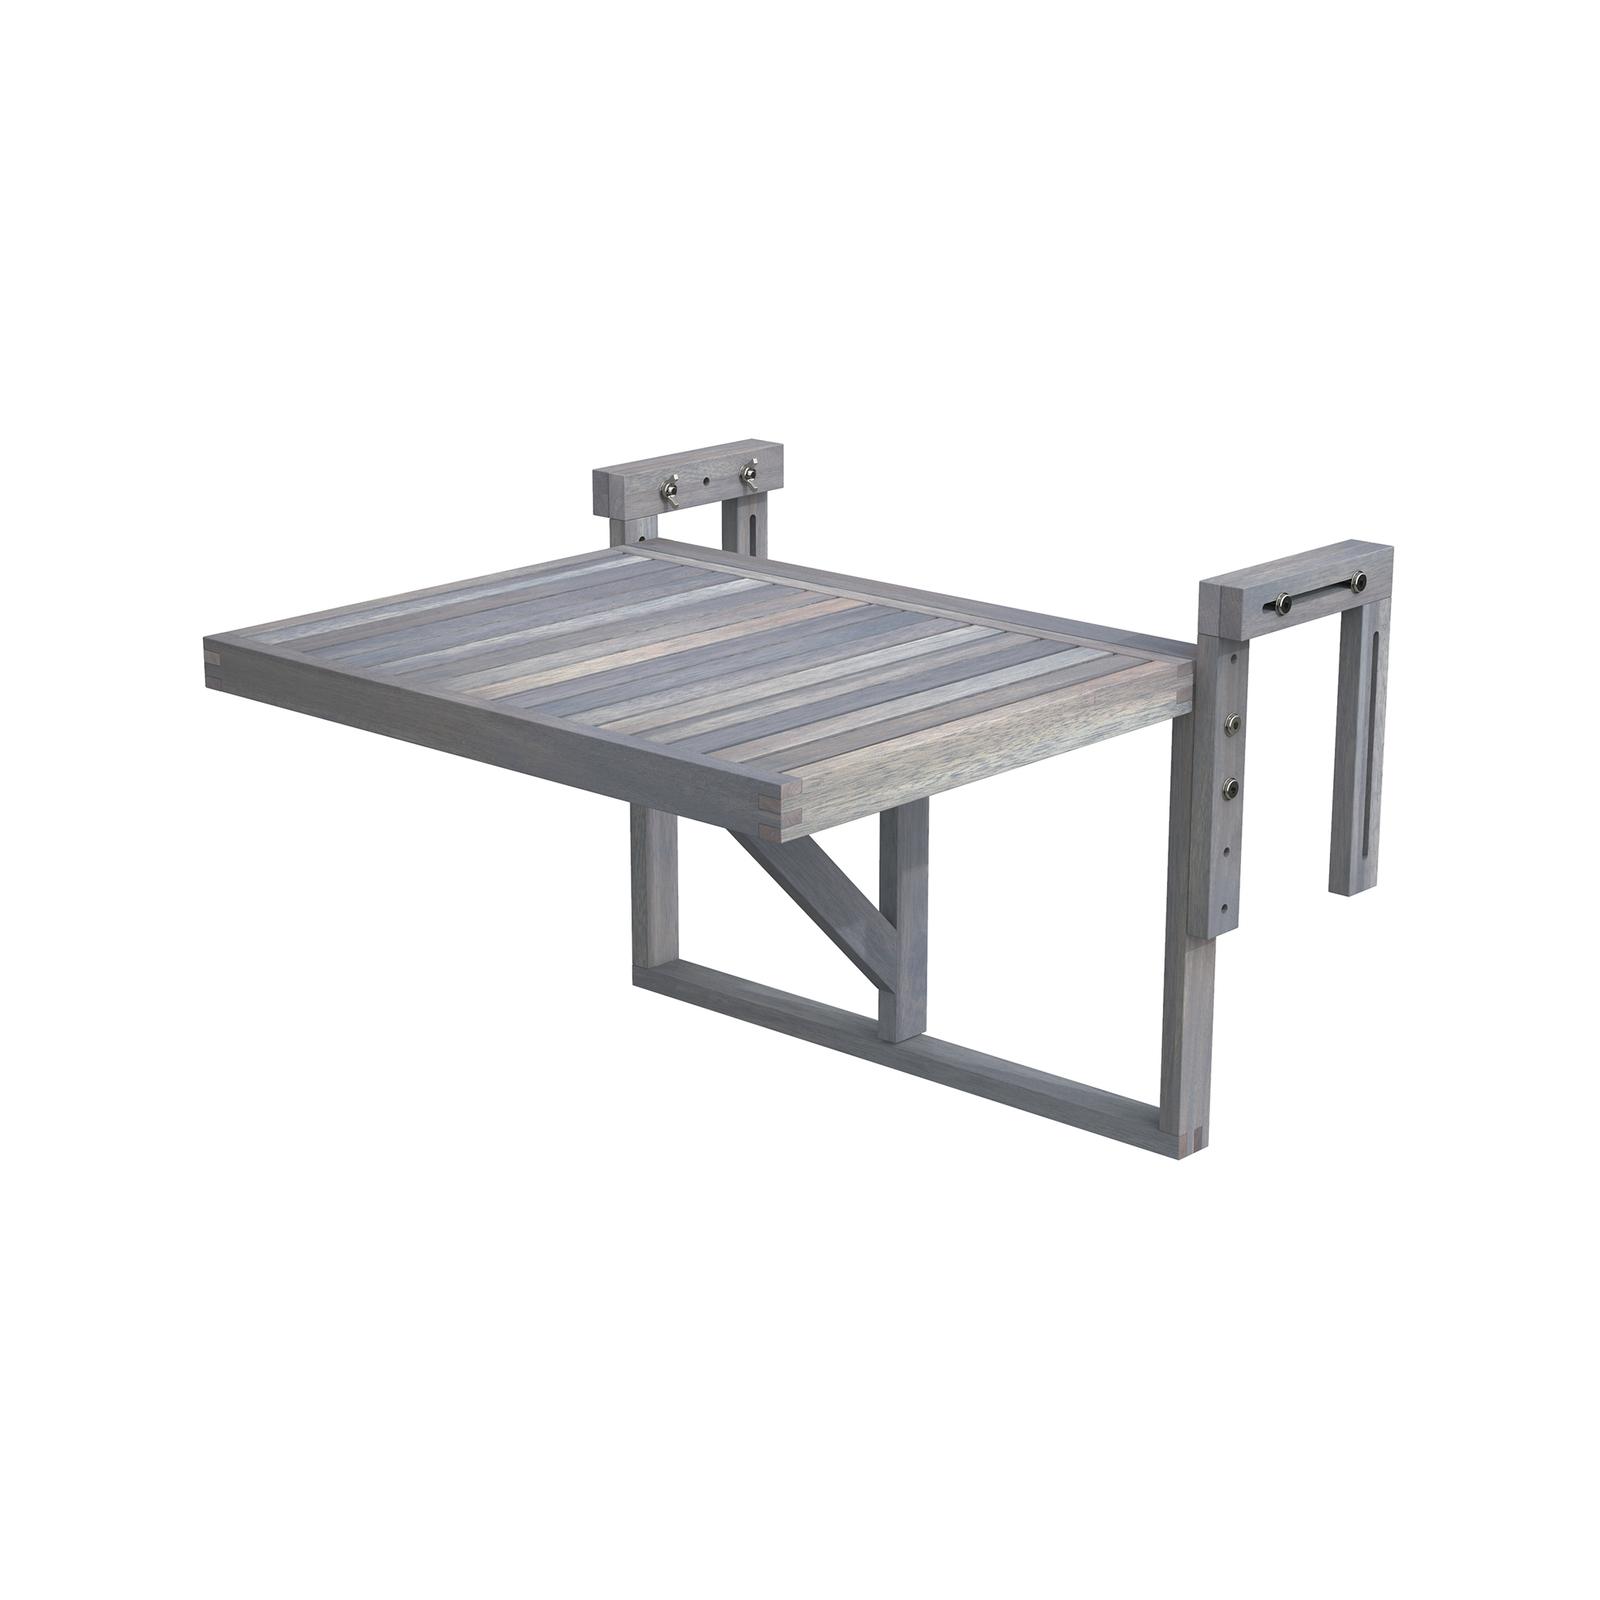 Interbuild 60 x 45cm Dusk Grey Stockholm Folding Balcony Table